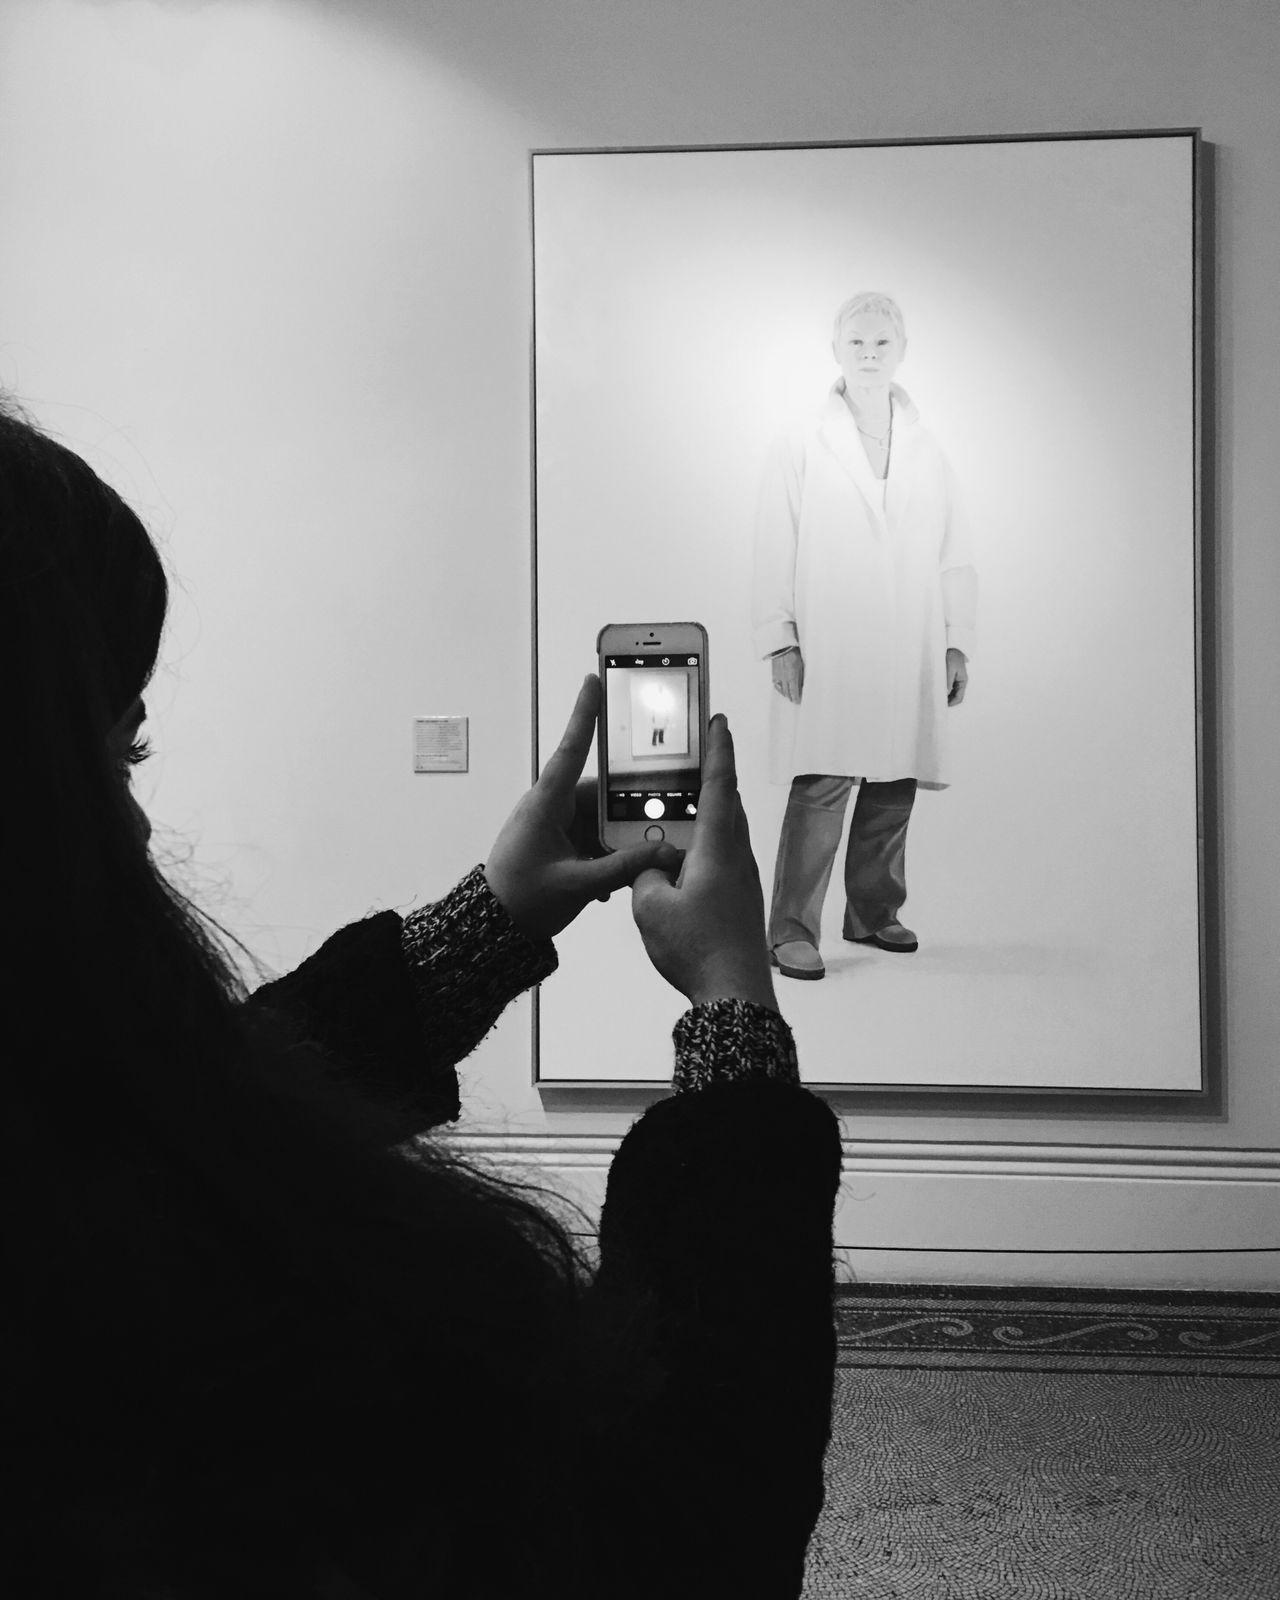 M IPhoneography Iphonephotography Iphonesia VSCO Blackandwhite Monochrome Showcase April